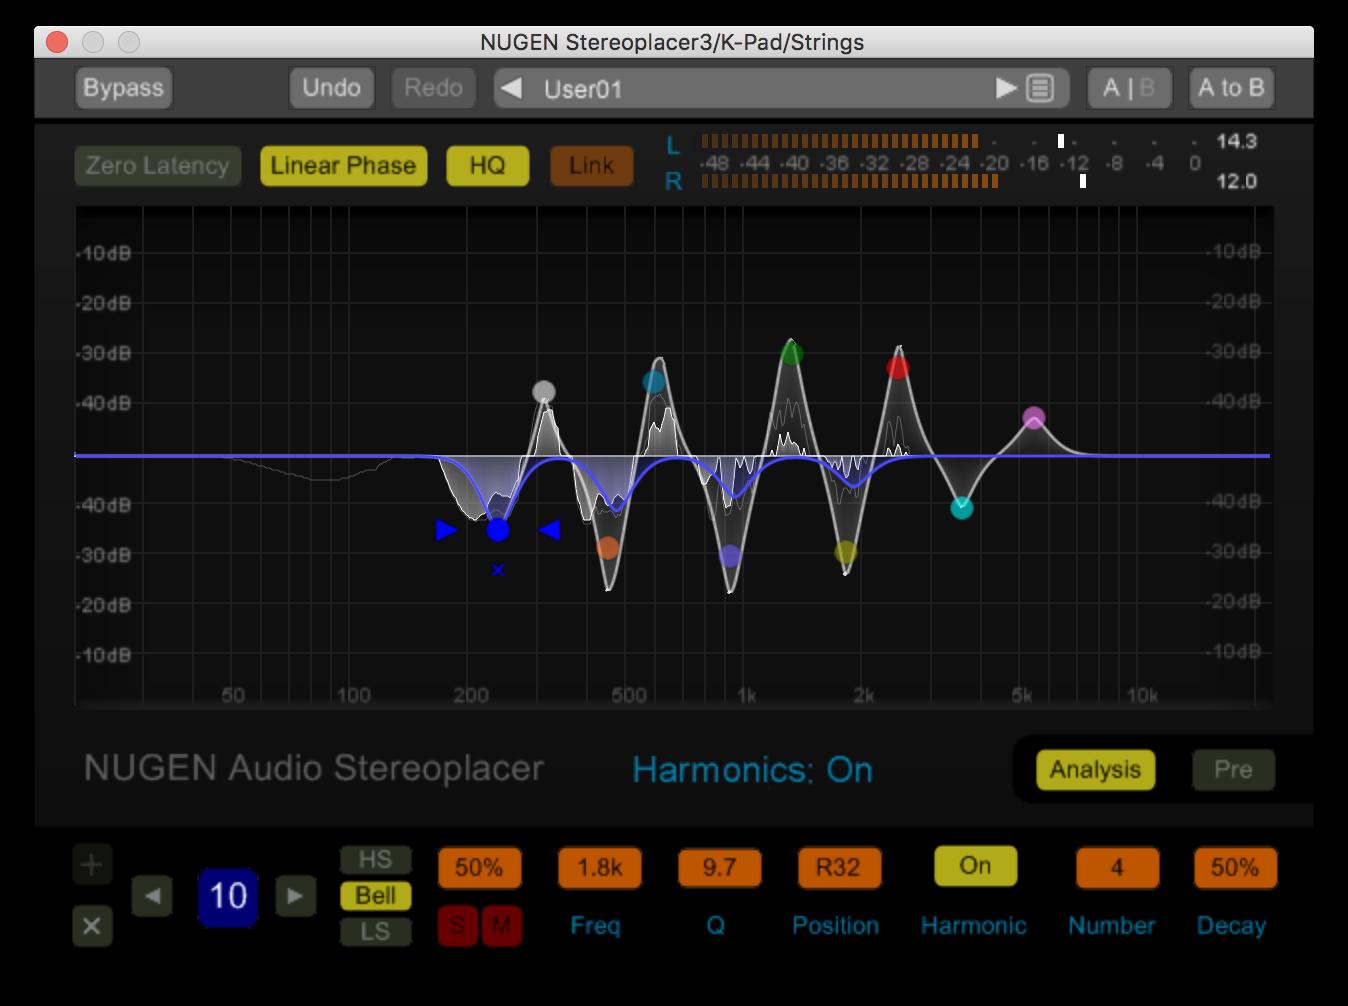 20180509_koyas-nugen-audio-ableton-live-tutorial-03-07-stereoplacer-harmonic